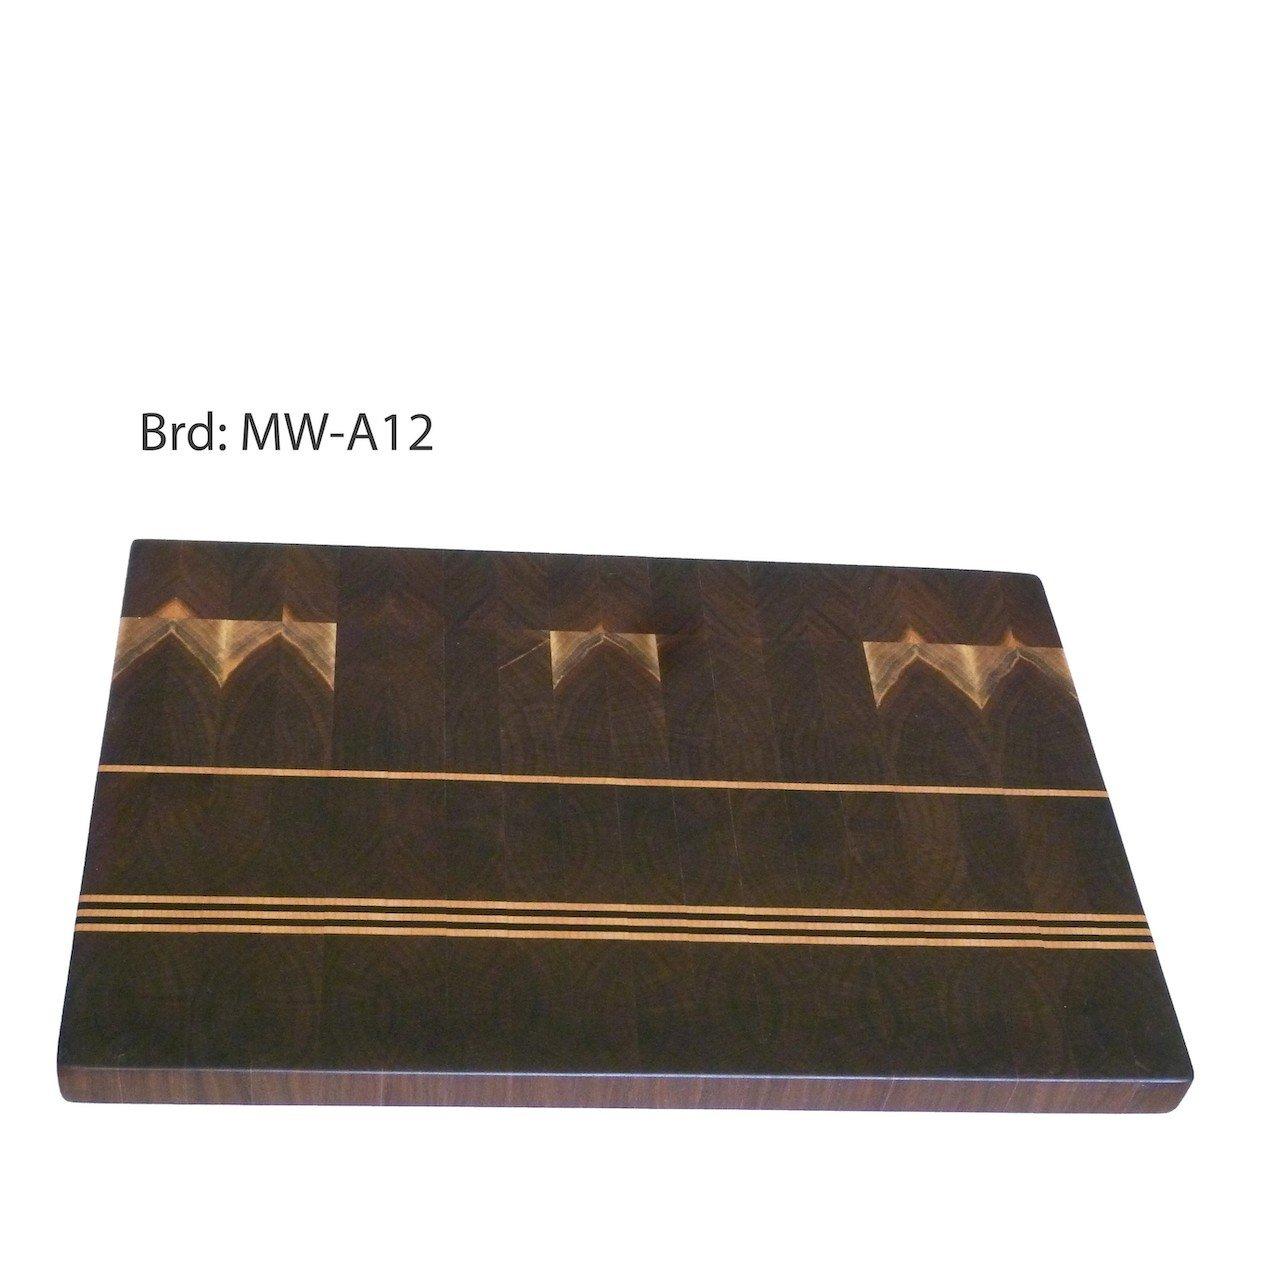 MW-A12